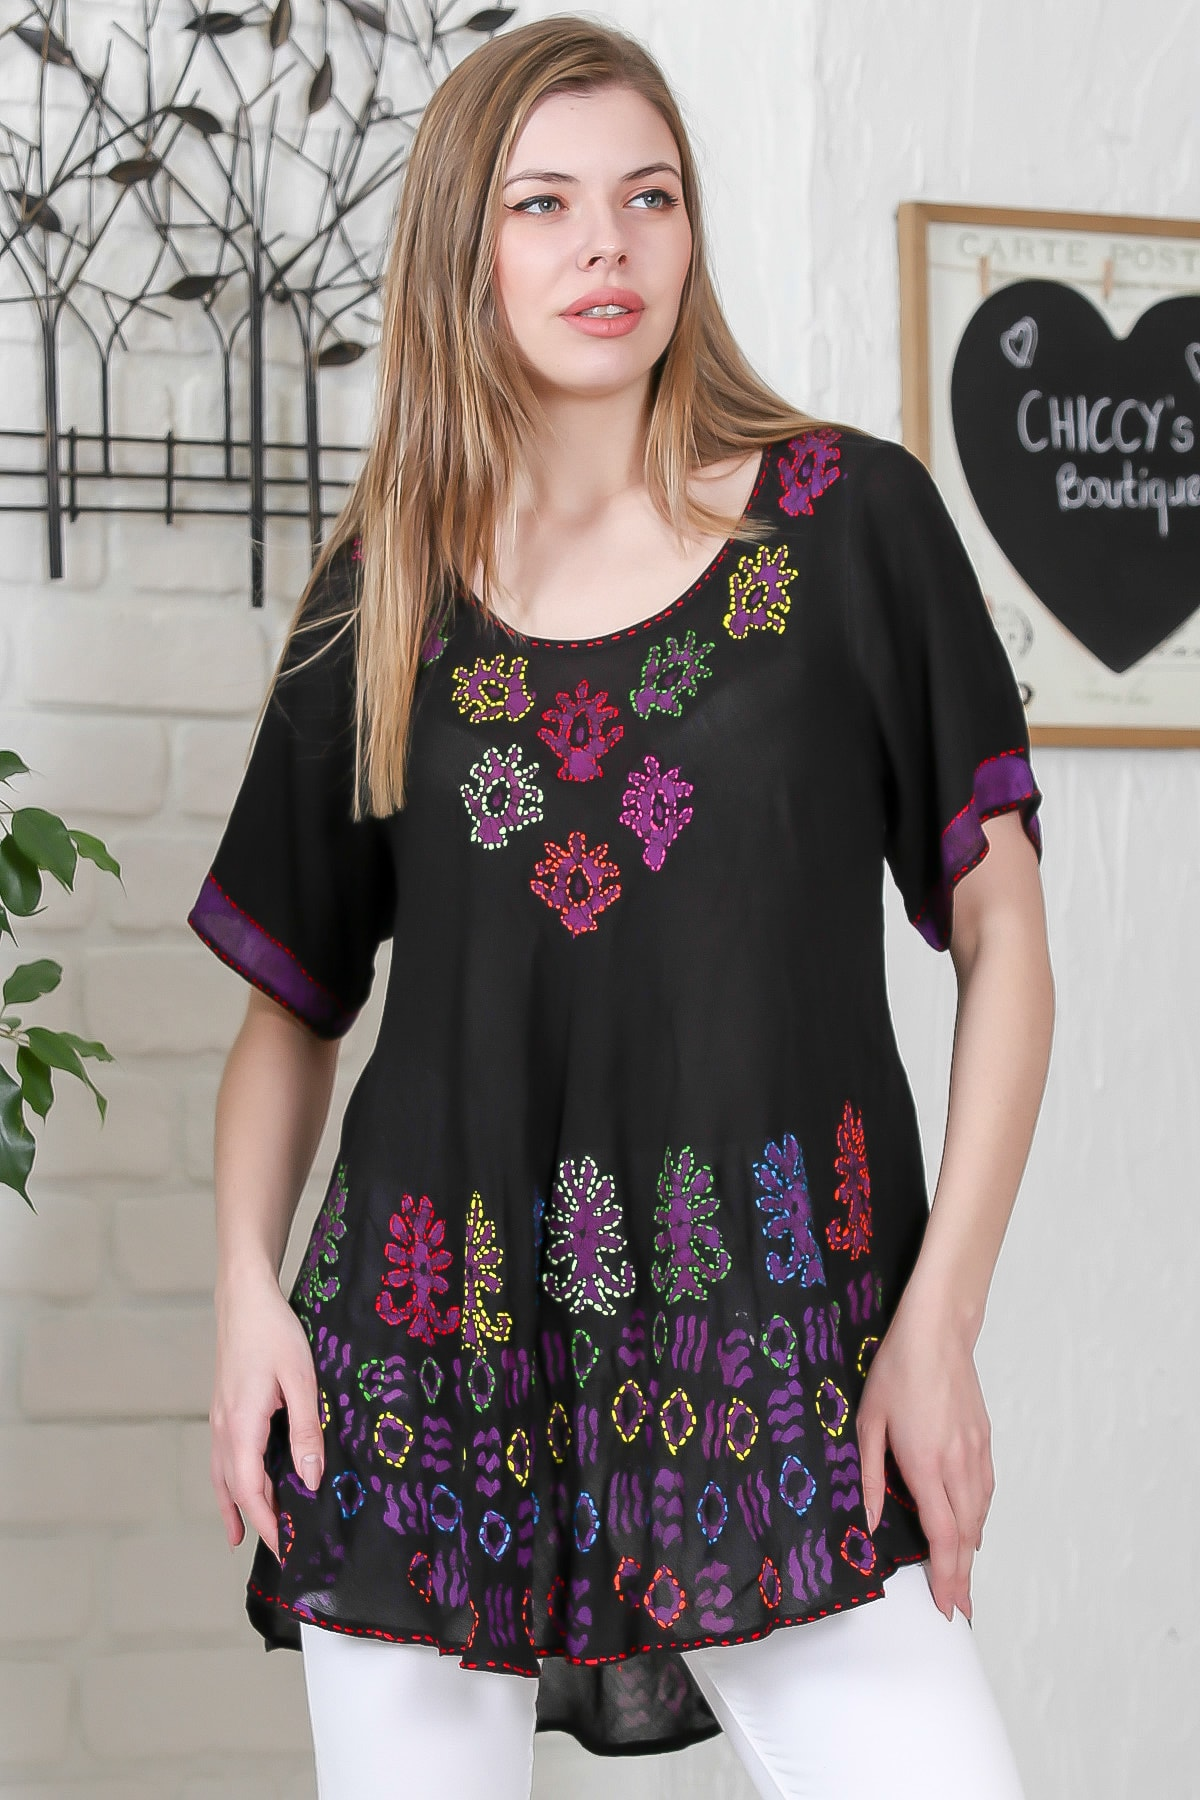 Chiccy Kadın Siyah Çiçek Baskılı Nakış Dikişli Kısa Kol Batik Salaş Dokuma Bluz M10010200BL95495 0